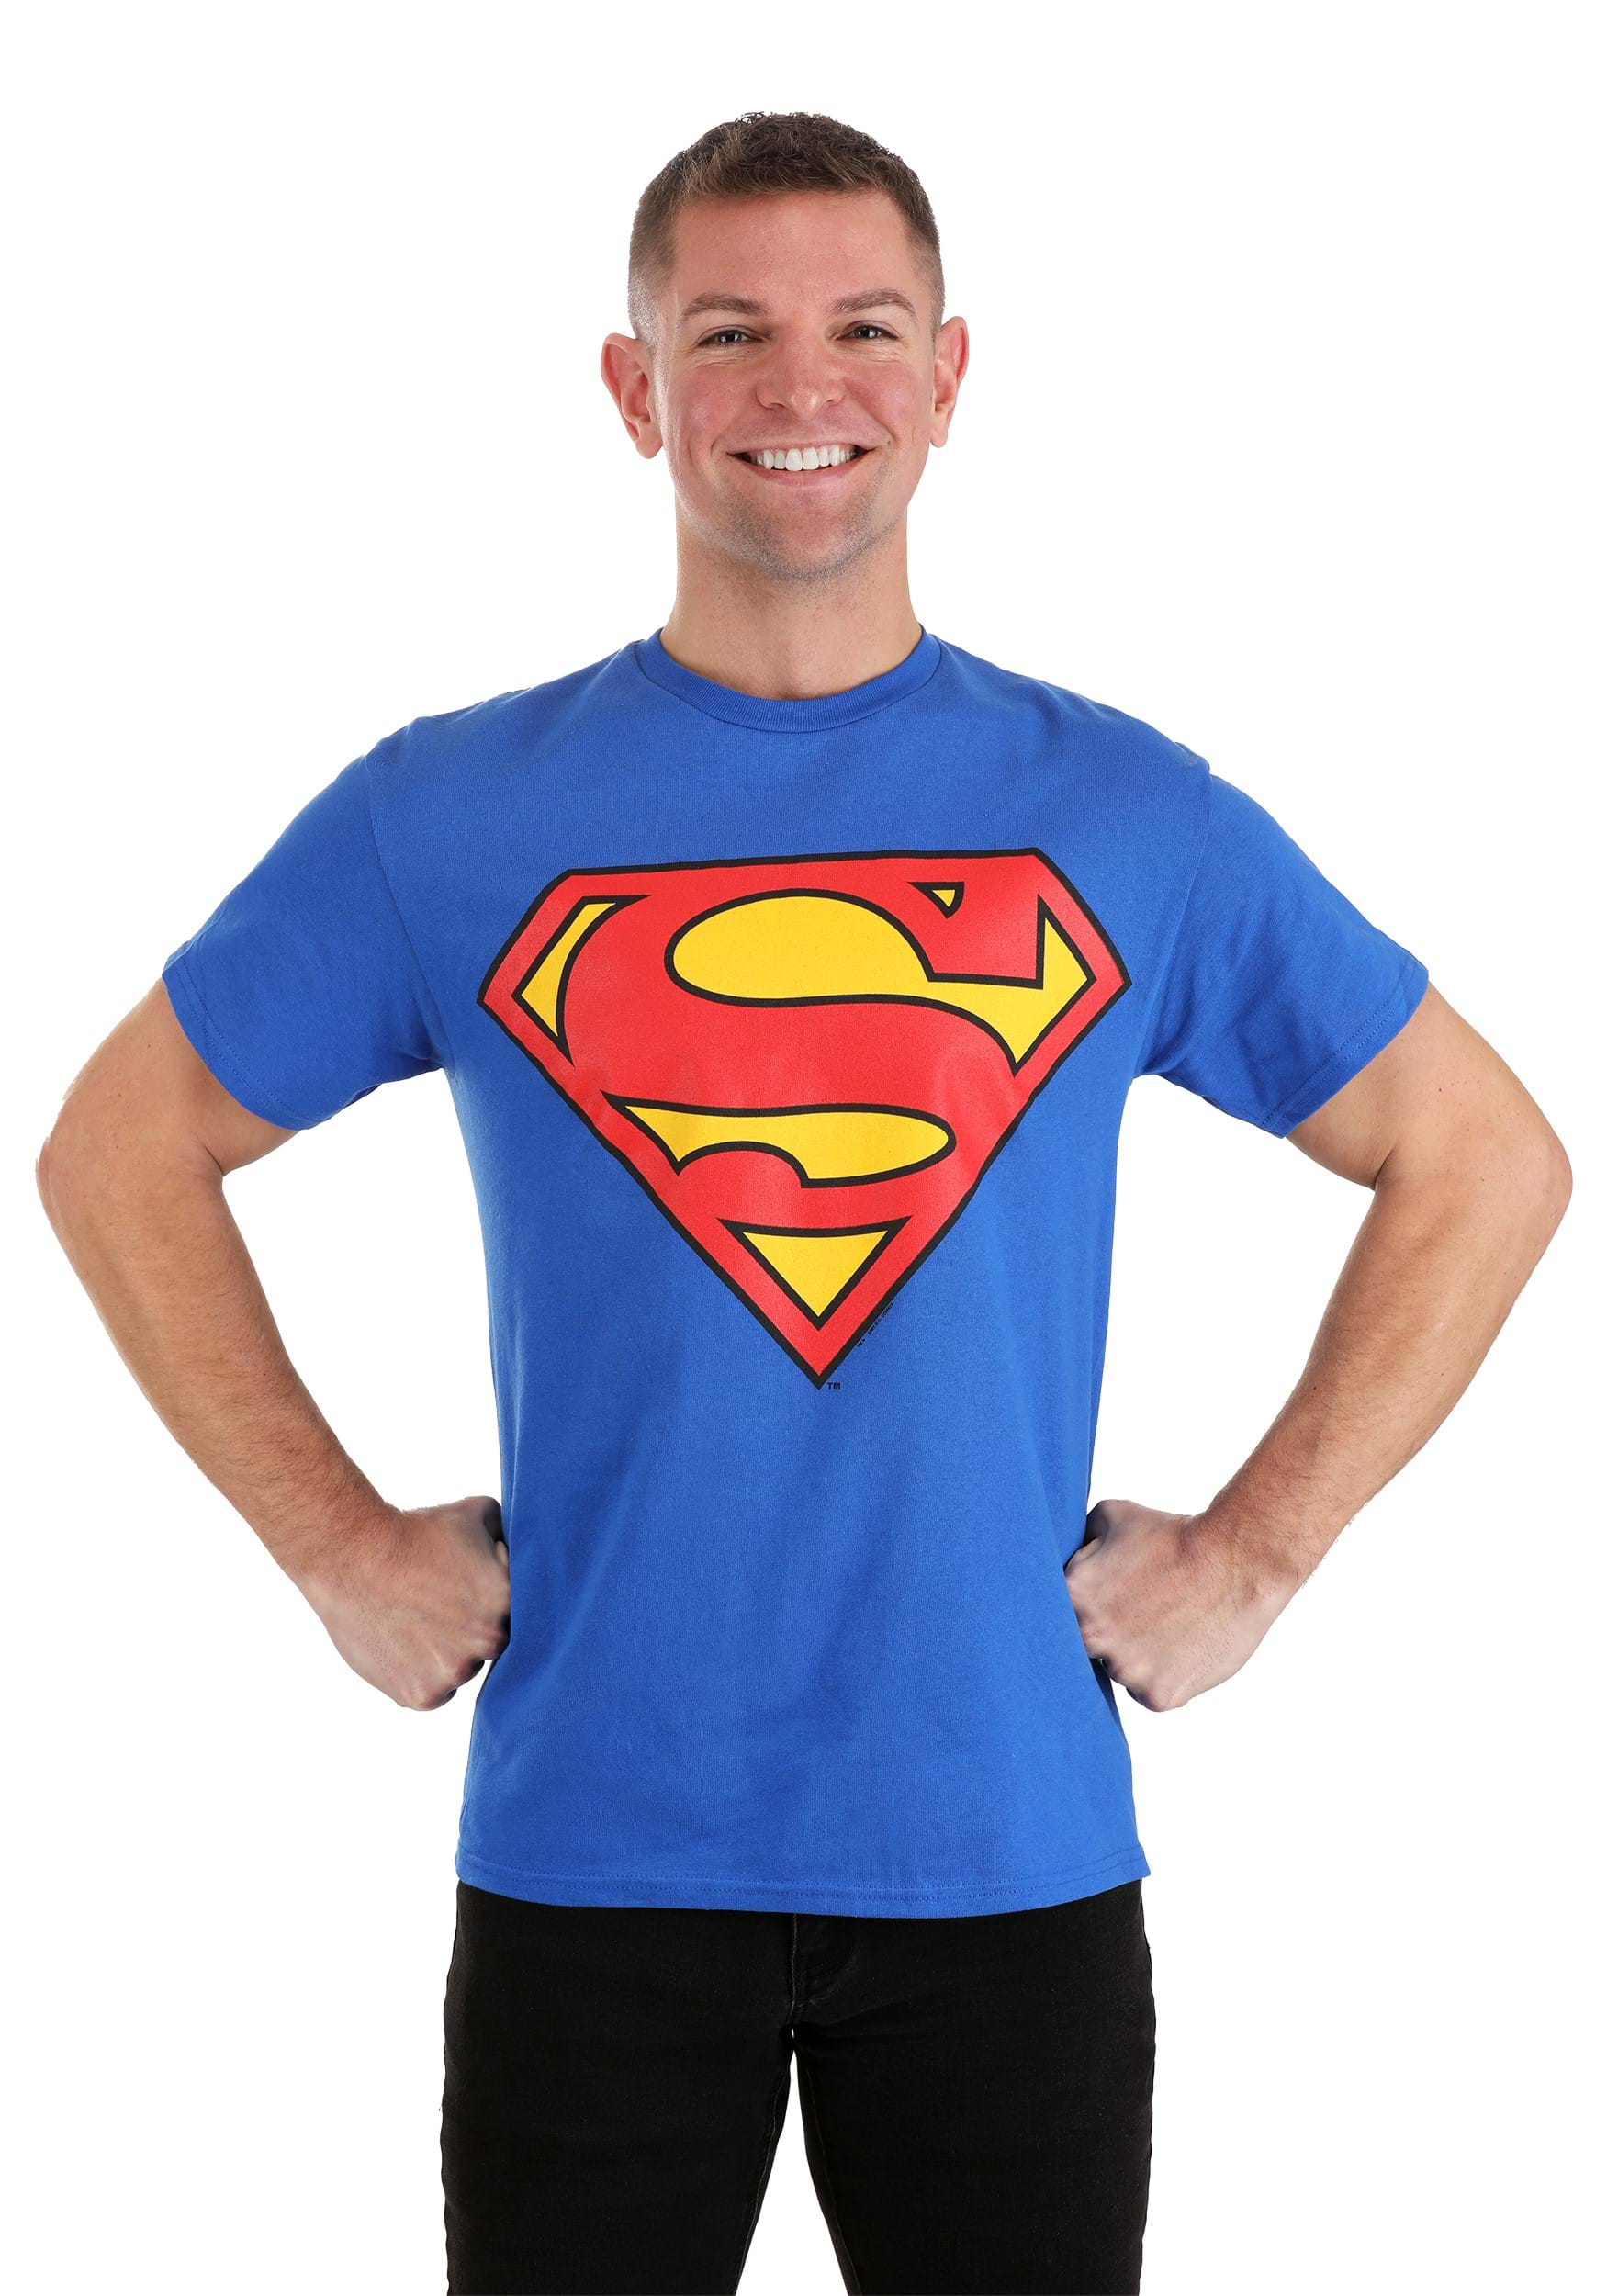 superman shield costume t shirt. Black Bedroom Furniture Sets. Home Design Ideas